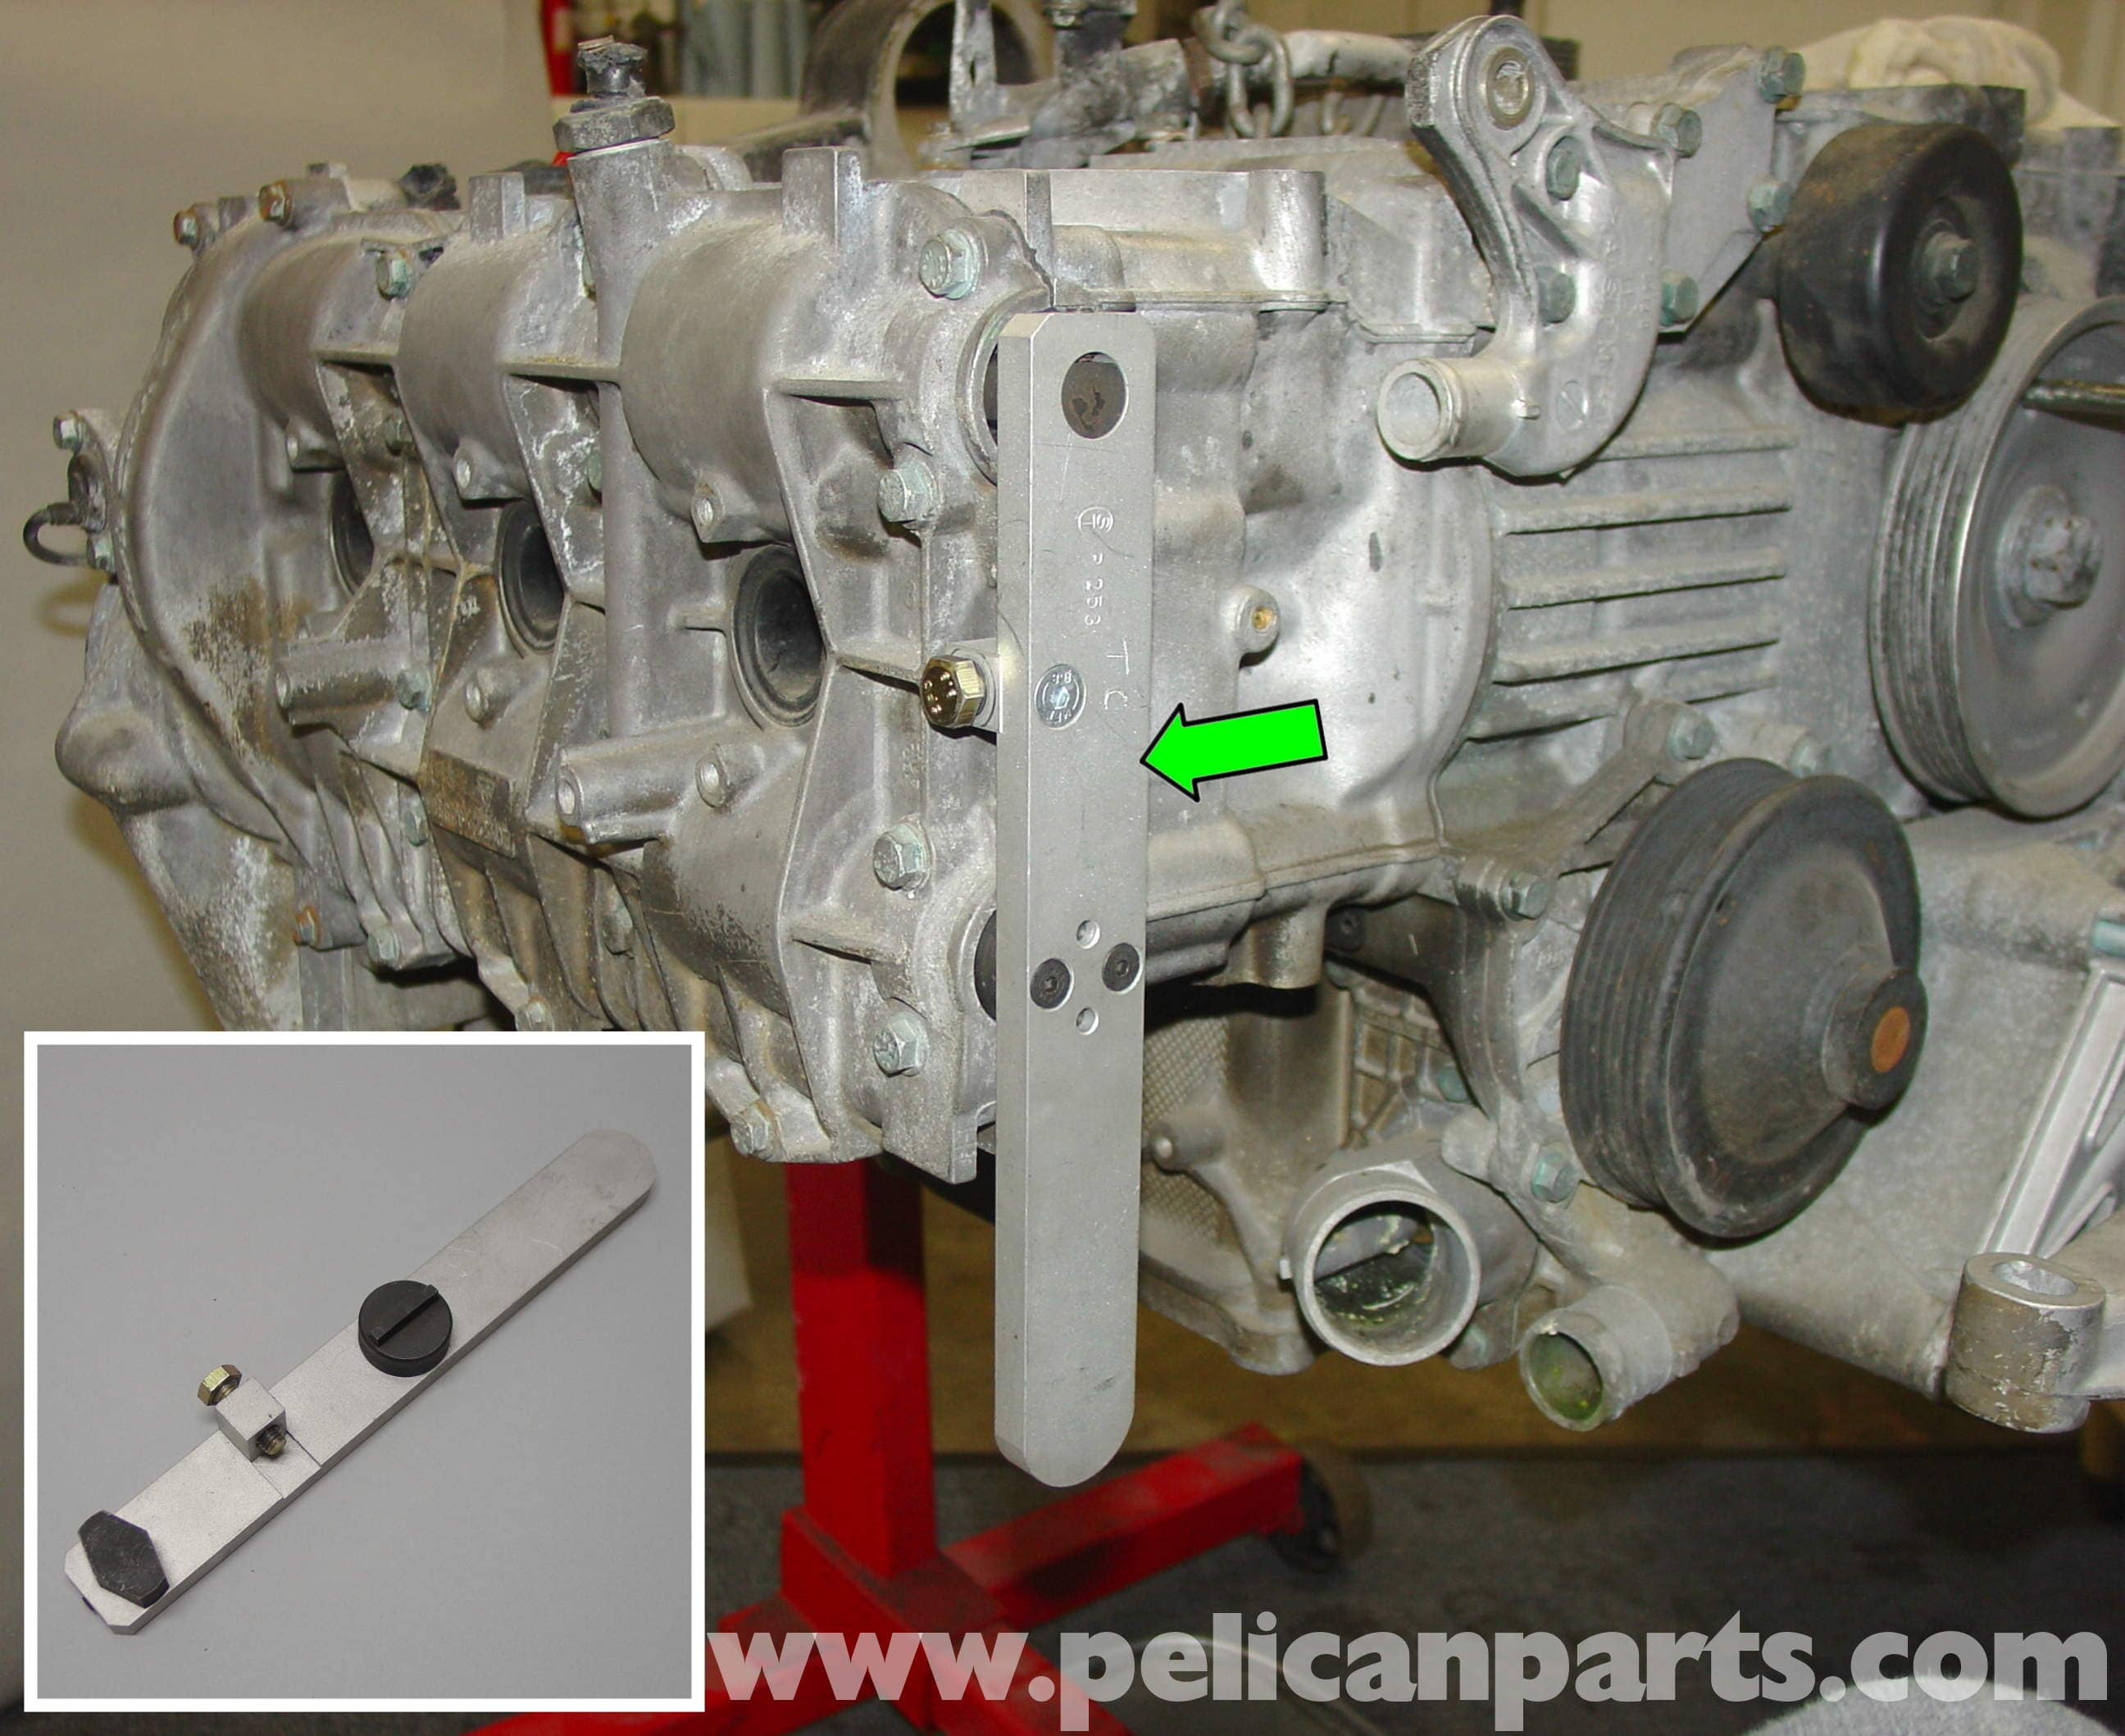 Porsche Boxster Camshaft Upgrade / Chain Tensioner